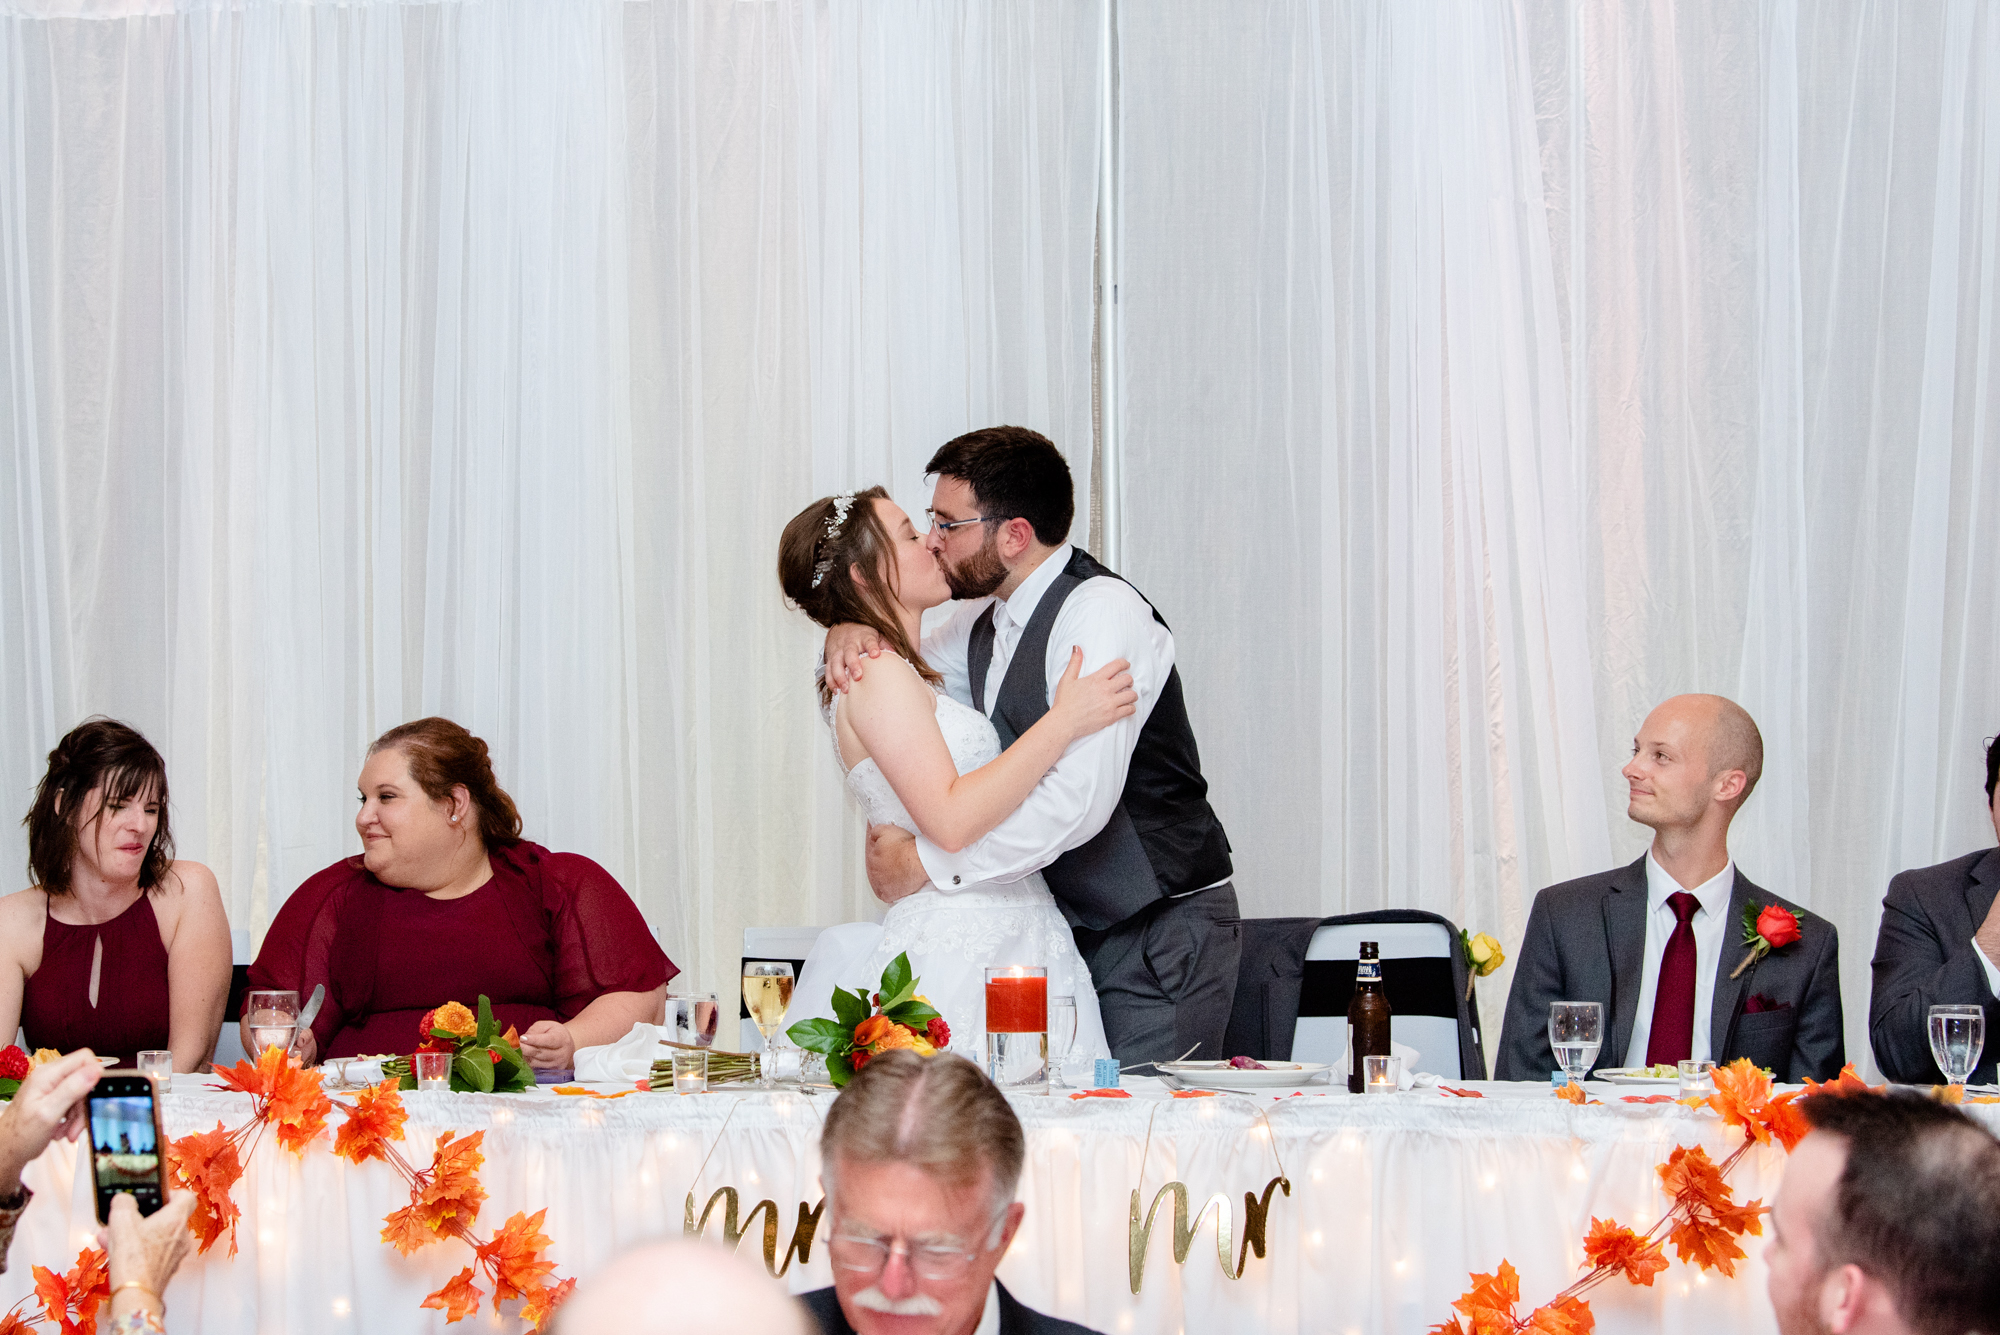 DSC 8851 - Emma and Chris | Fargo Wedding